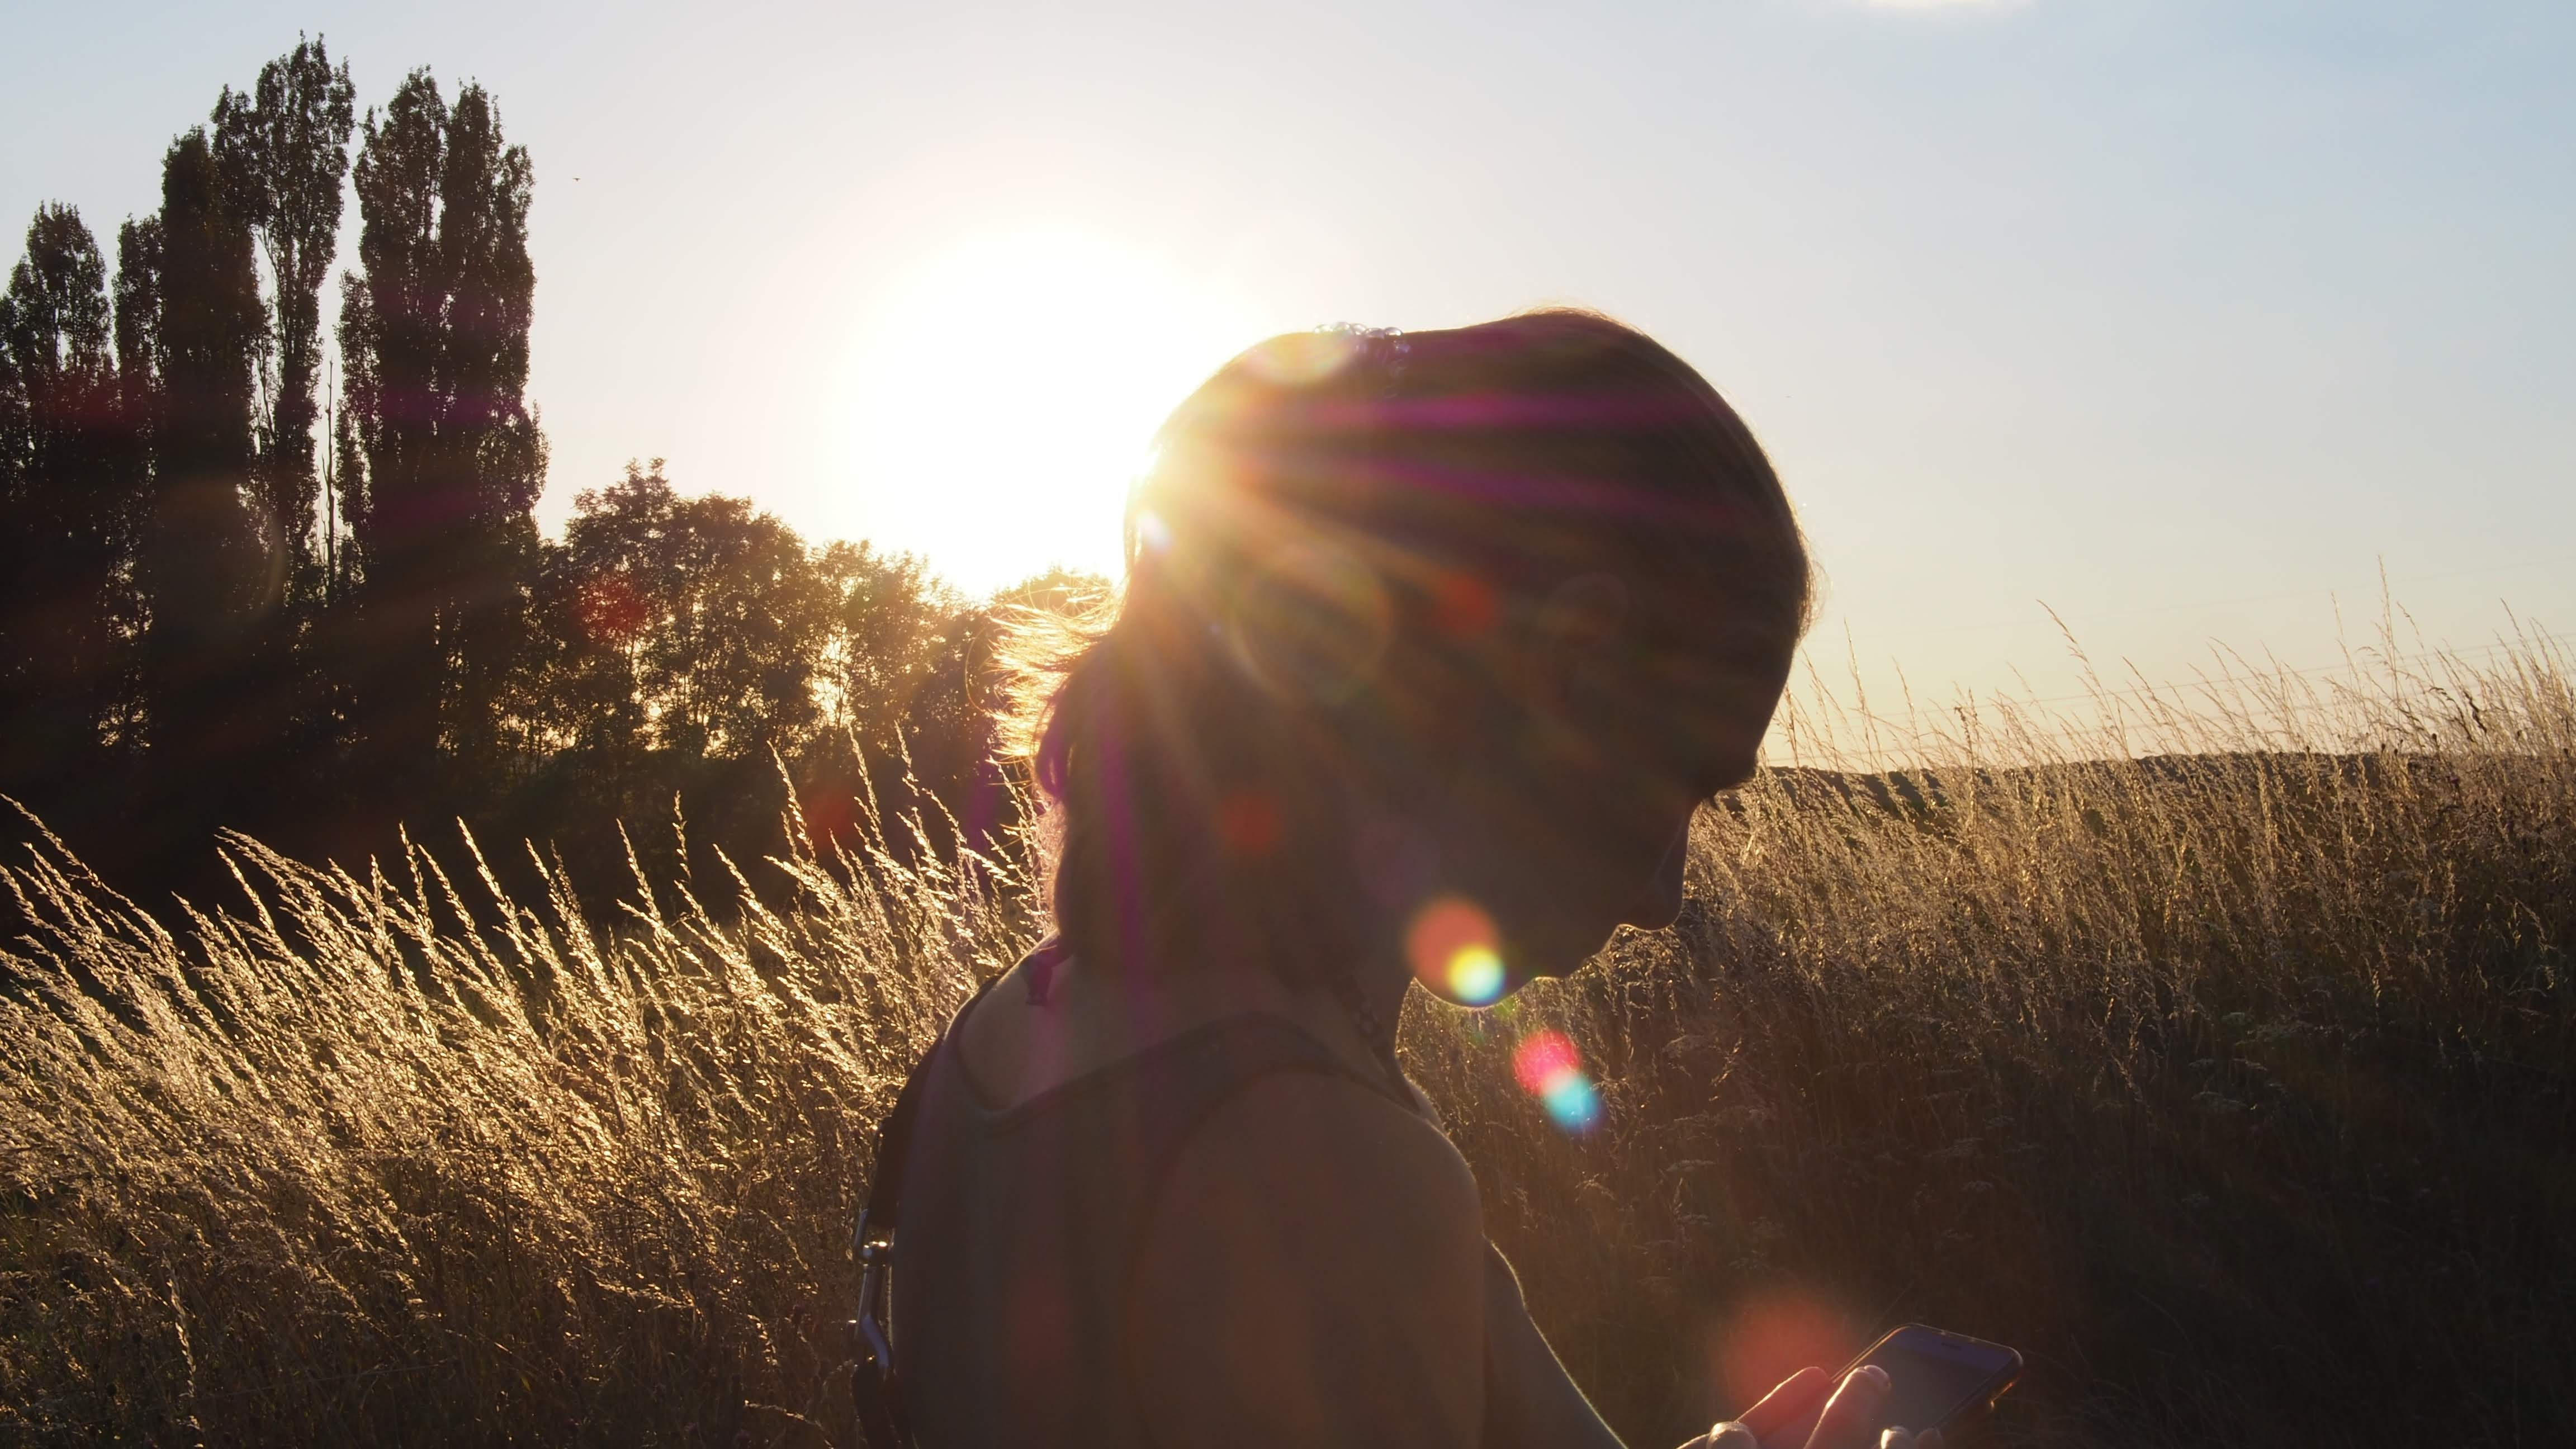 Silhouette of Woman Standing Near Green Grass Plants